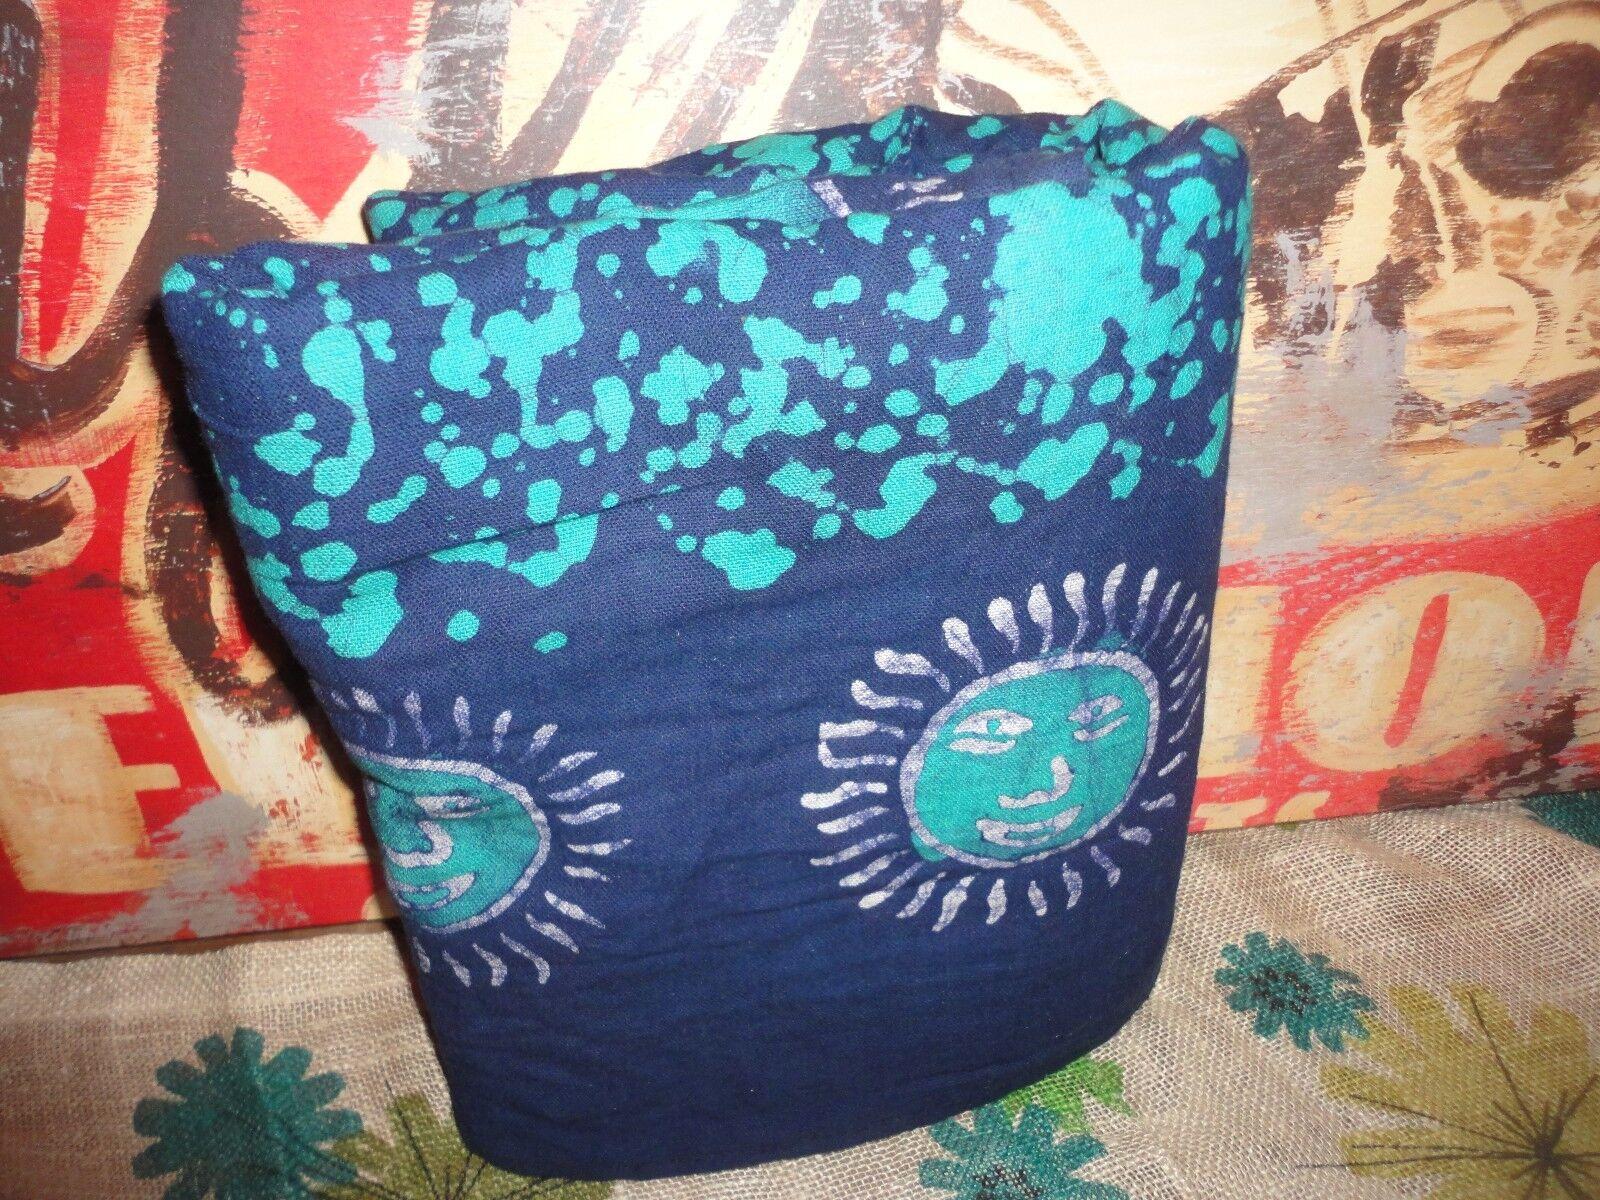 INDIA ART CULTURAL BOHO MAGENTA SUN Blau TEAL FULL FLAT SHEET BED COVER 82 X 100